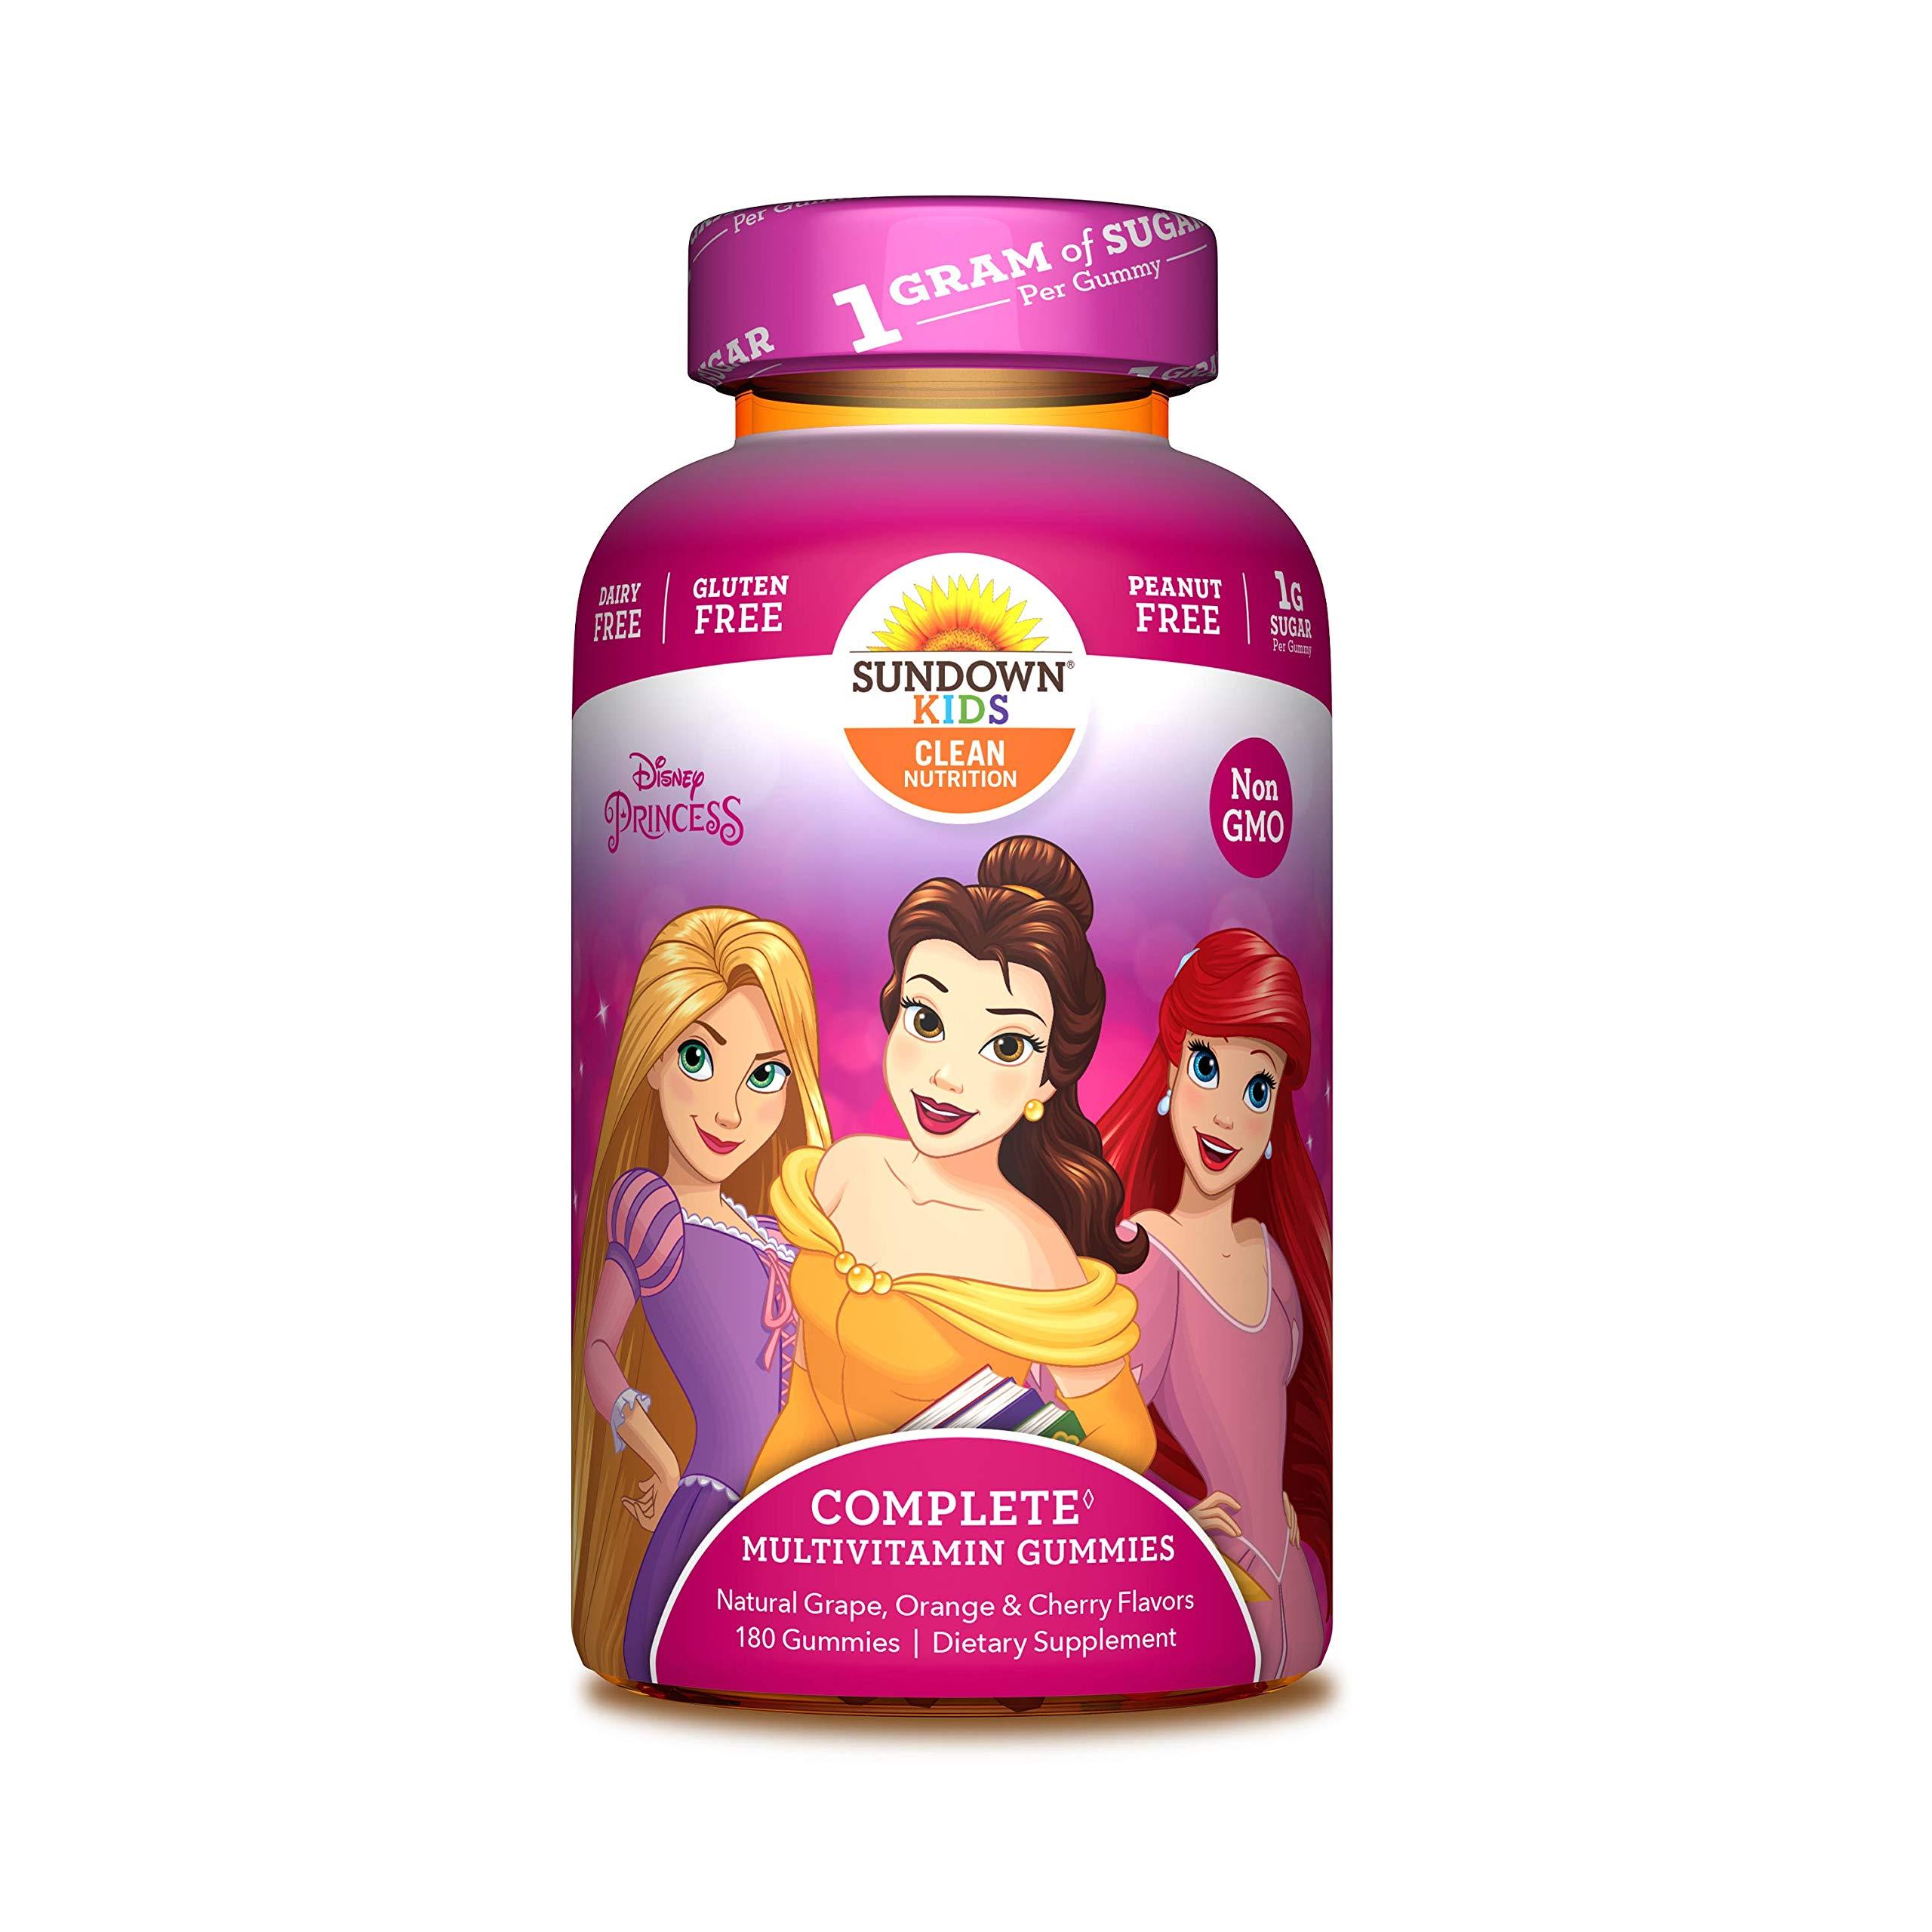 Sundown Kids Disney Princess Multivitamin Gummies, Vitamins A, C, D, E, Gluten-Free, Dairy-Free, Peanut-Free, 180 Count